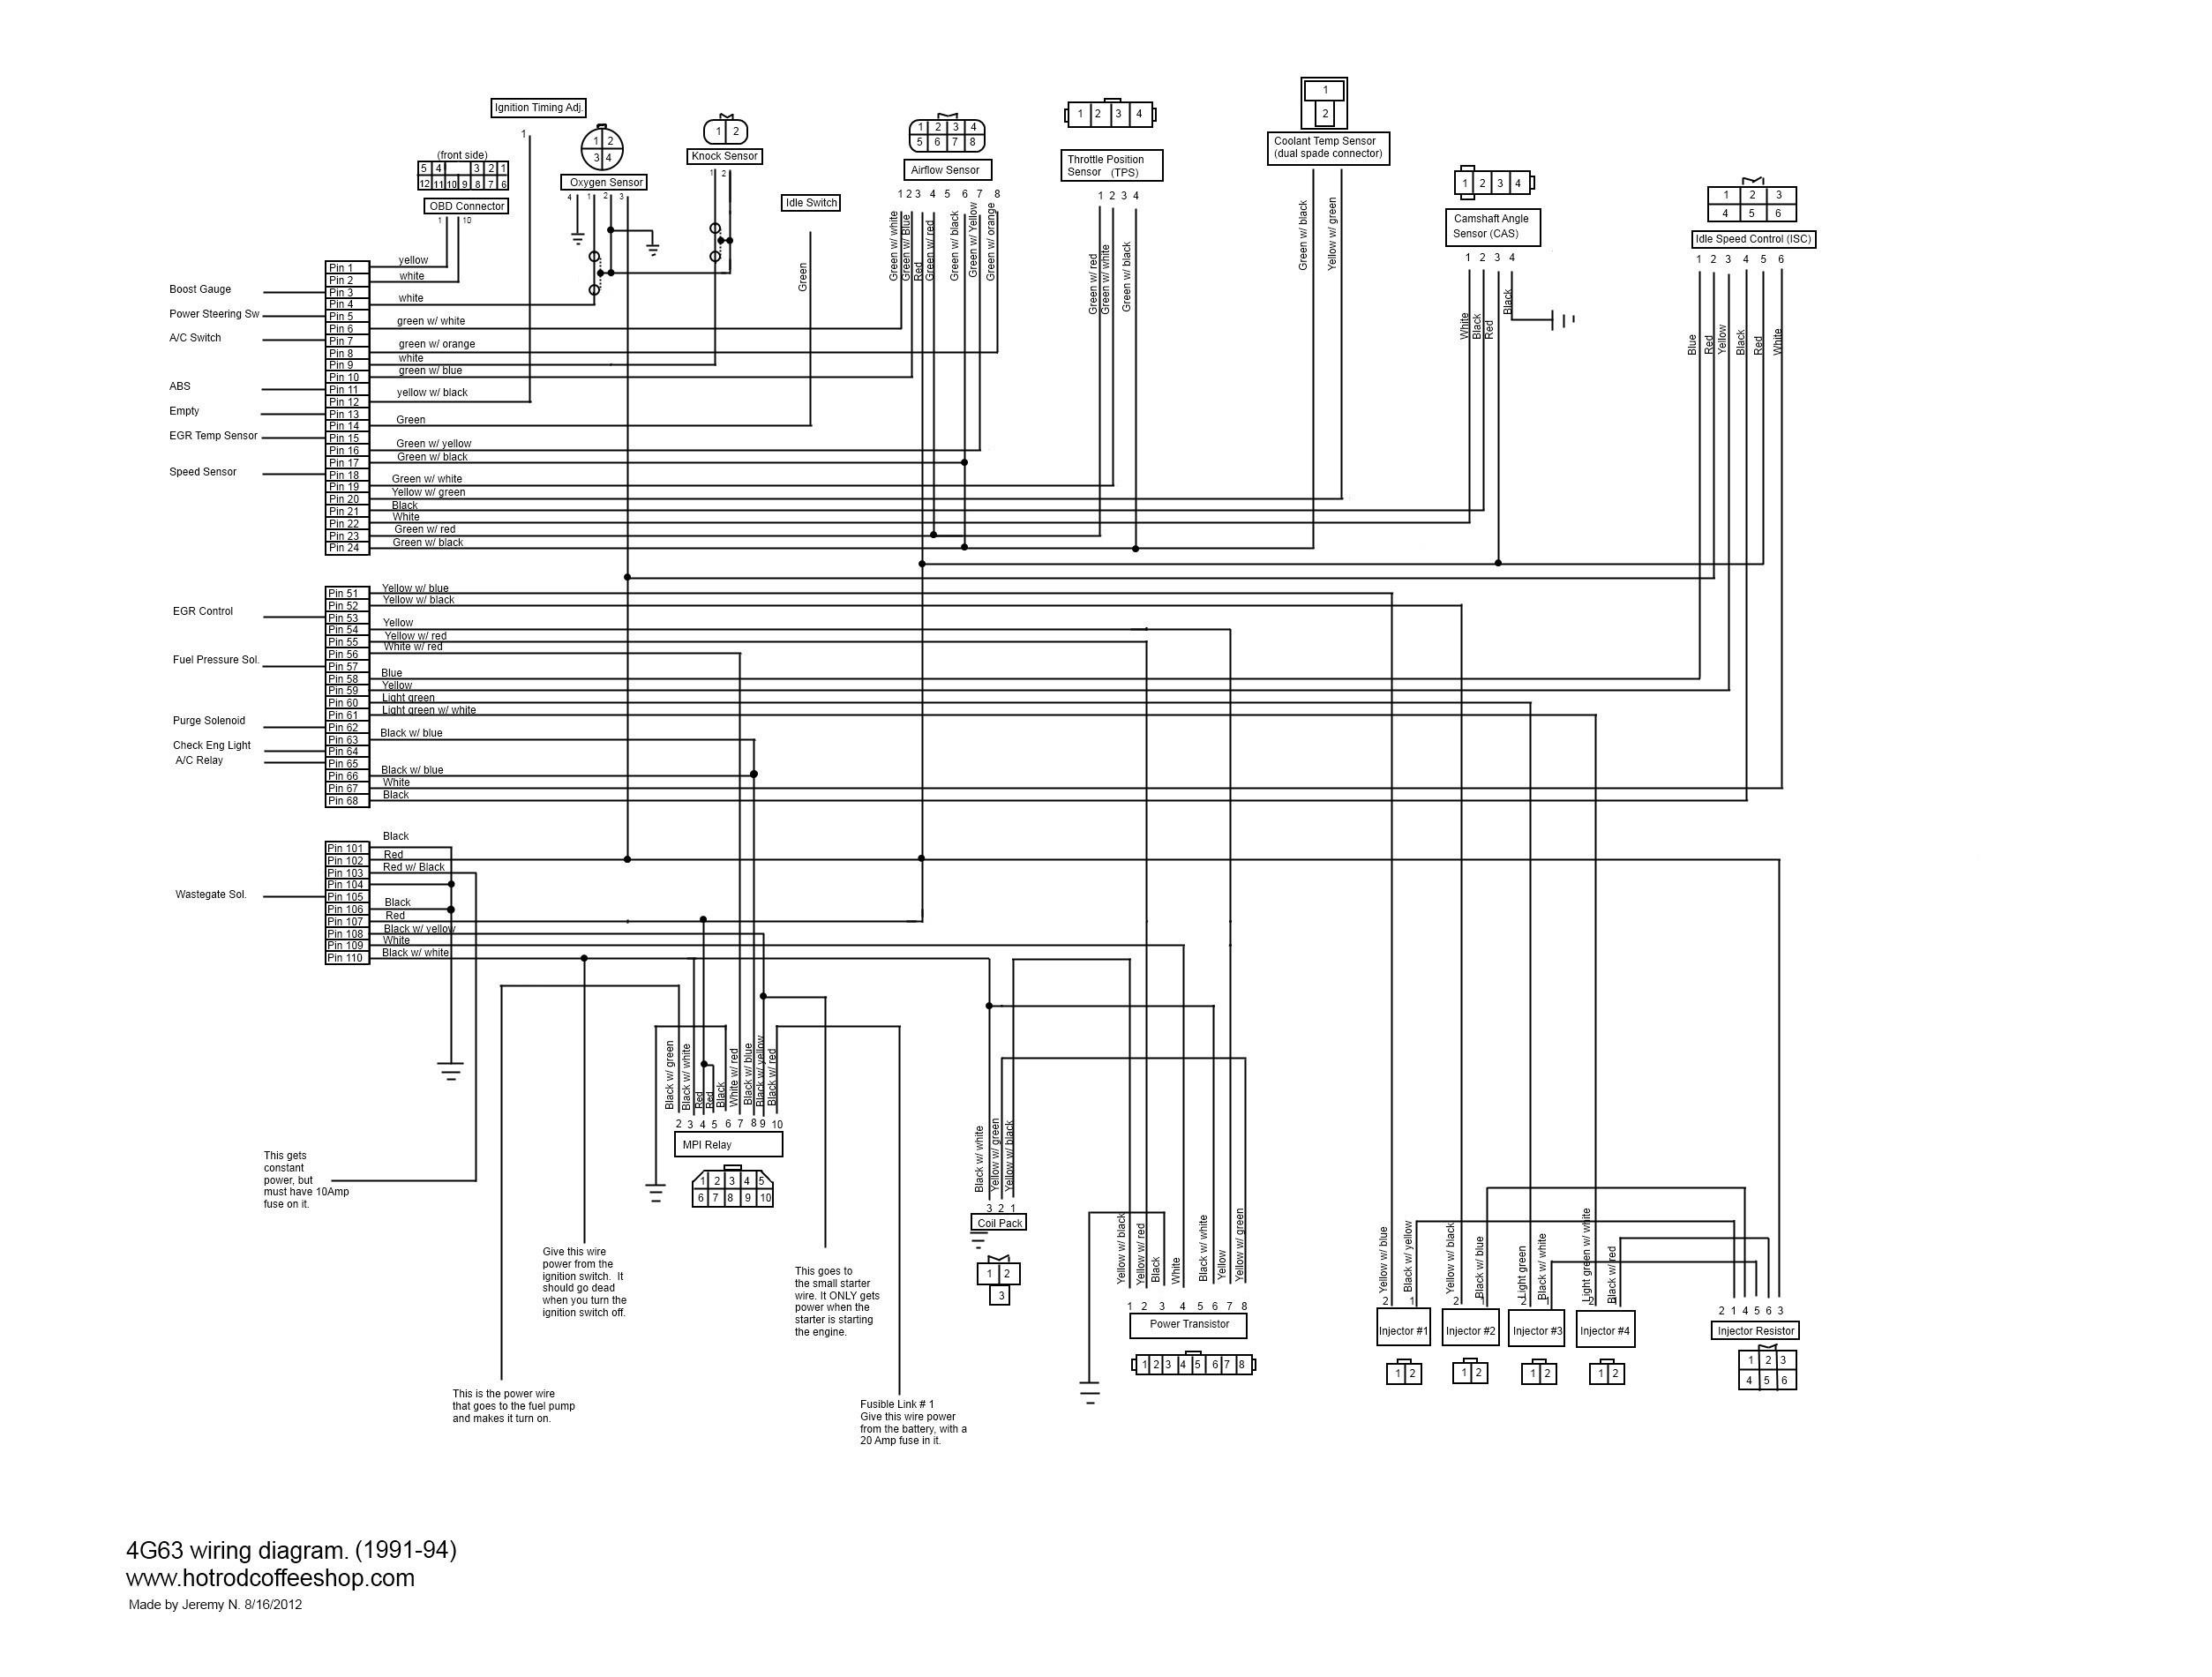 Mitsubishi Engine Diagram Mitsubishi Galant Engine Diagram Wiring Diagram  Mitsubishi Of Mitsubishi Engine Diagram Electrical Wiring